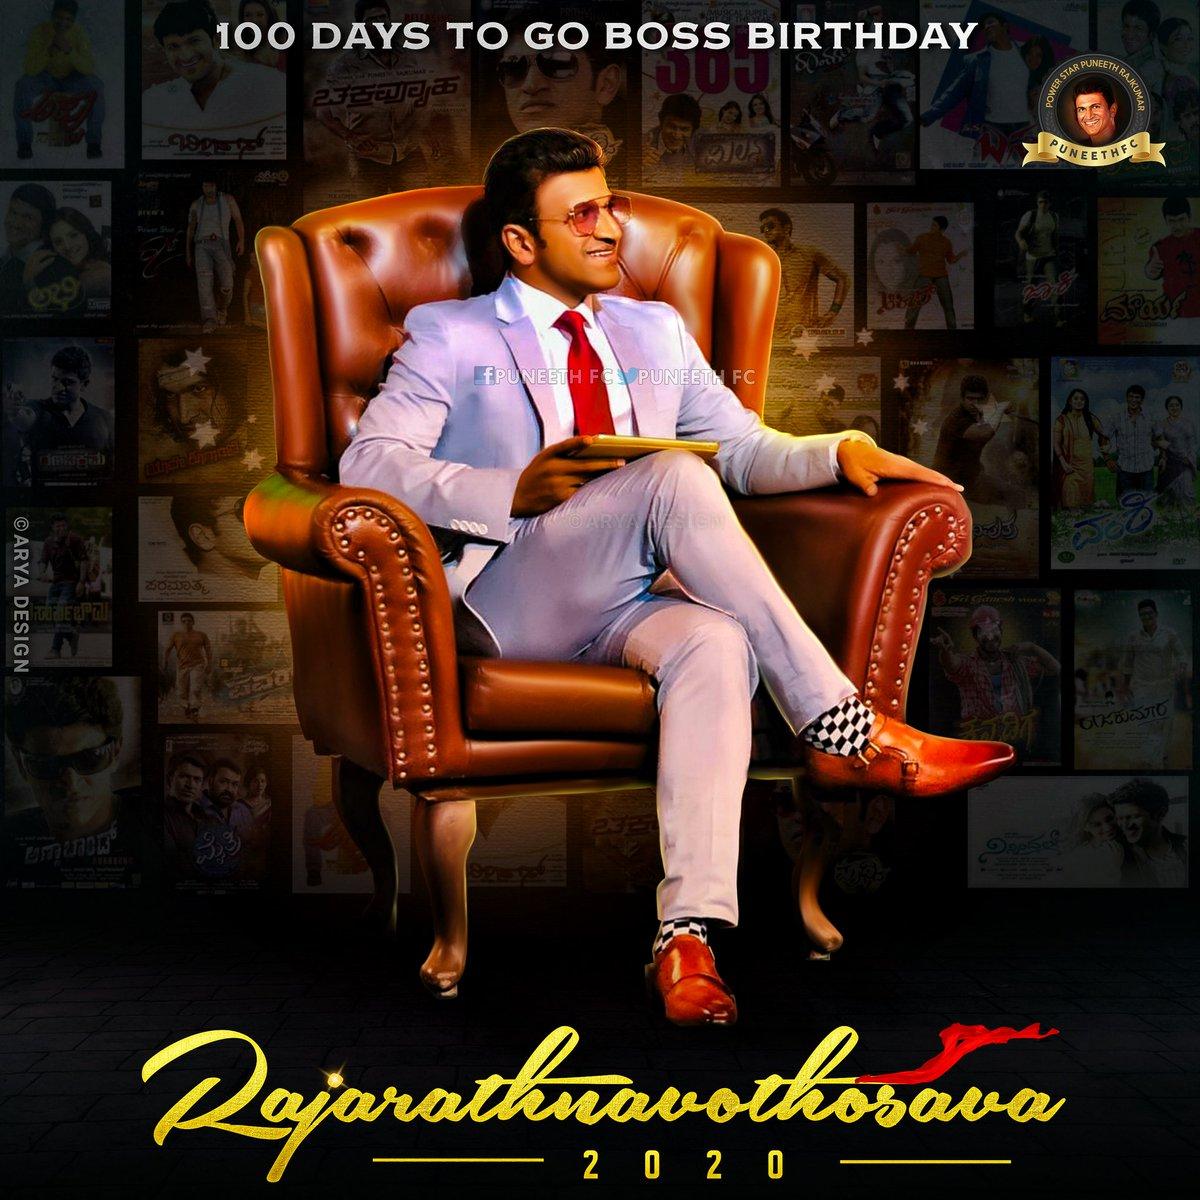 A Powerpacked Common DP For All Powerful Fans For PowerStar's 100 Days To Go Birthday ❤️ Change Yours Now 🤗  #TheRajkumars #100DaysToGoAppuBossBirthday #Rajarathnavothosava2020 #ರಾಜರತ್ನೋತ್ಸವ2020 #Appu #PowerStar #PuneethRajkumar #PuneethFC  @PuneethRajkumar